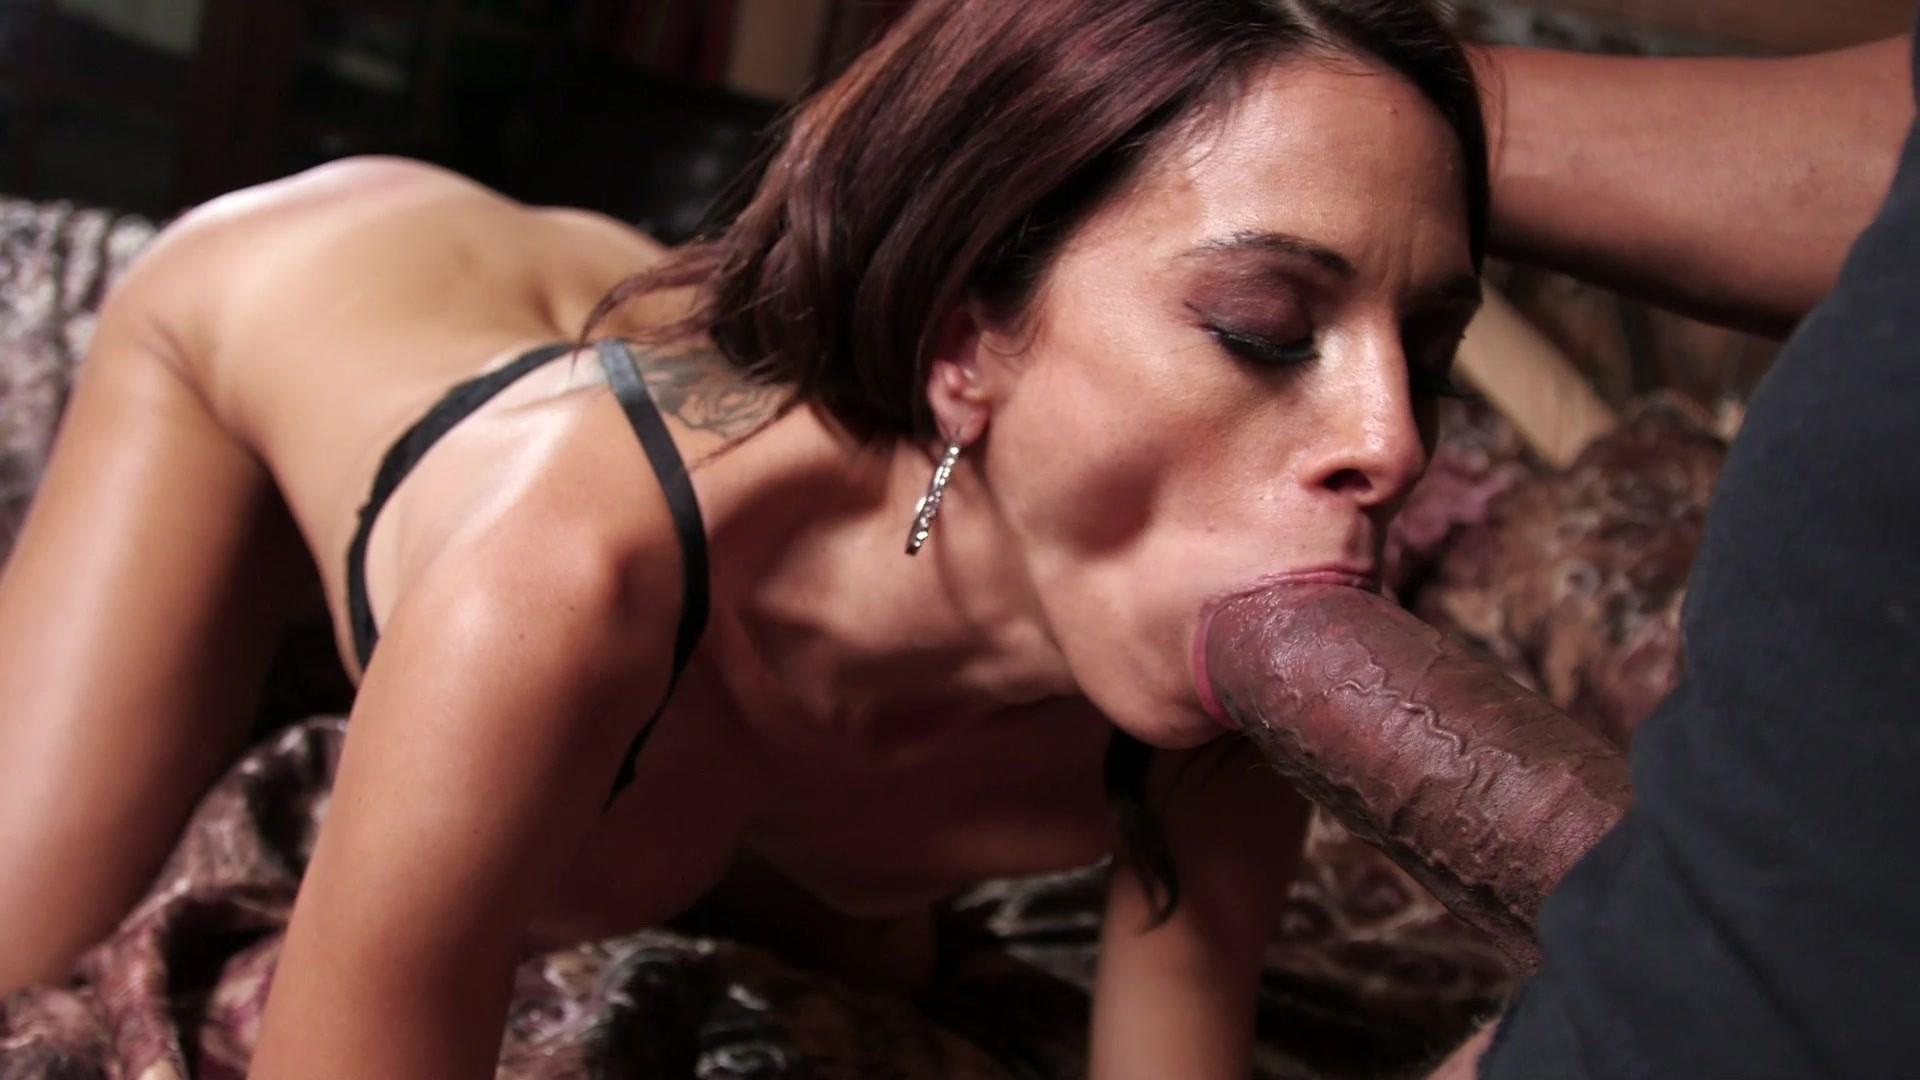 Black bull porn